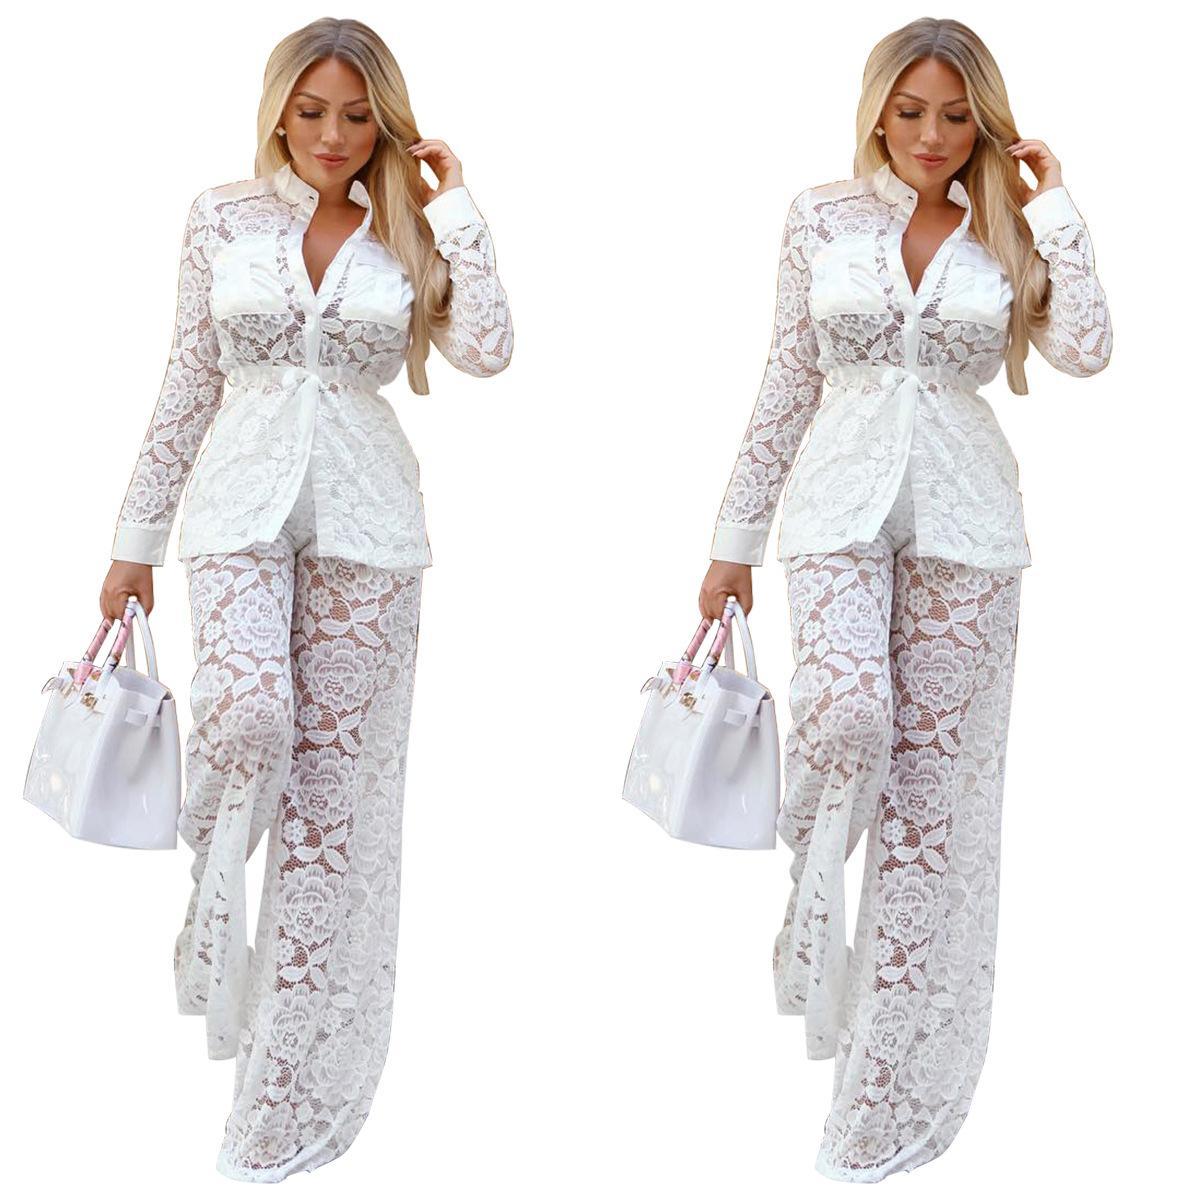 Solid White Women Lace Two Piece Set Long Sleeve Shirt Coat Top + Wide Leg Pants Elegant Female High Street Outfits 2pcs suit